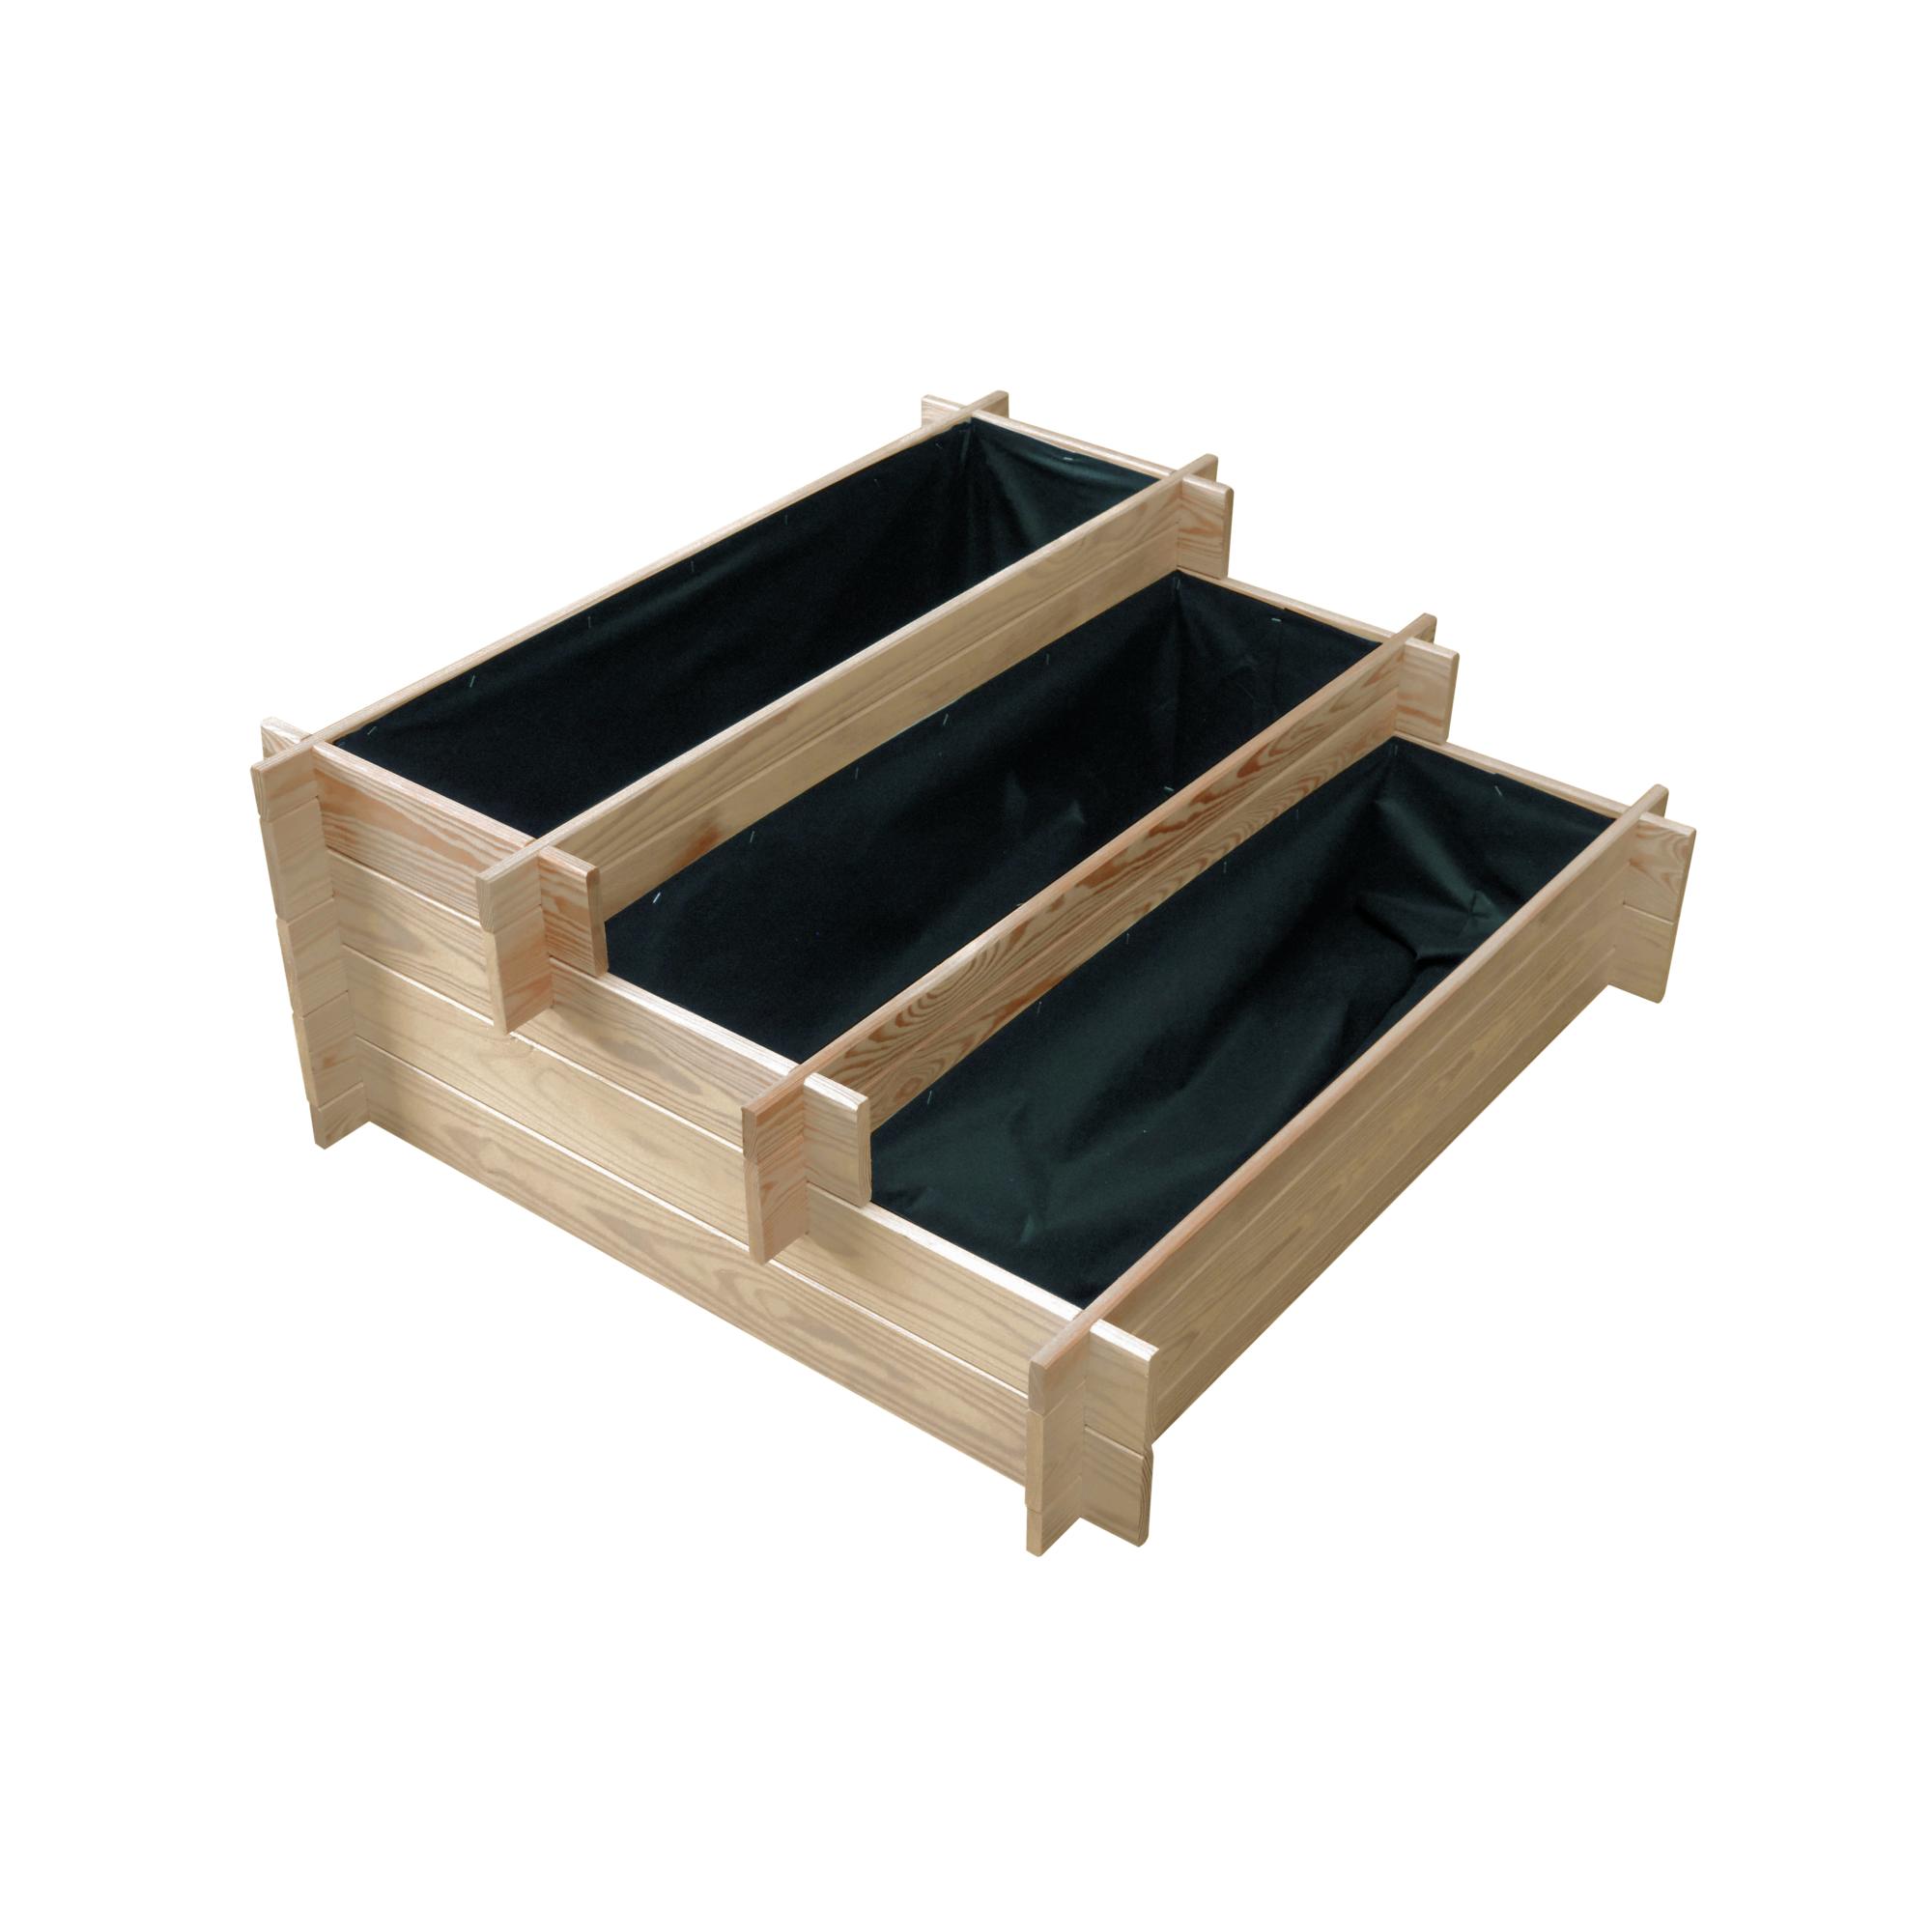 Holzbeet Linda 120 X 80 Cm Natur ǀ Toom Baumarkt